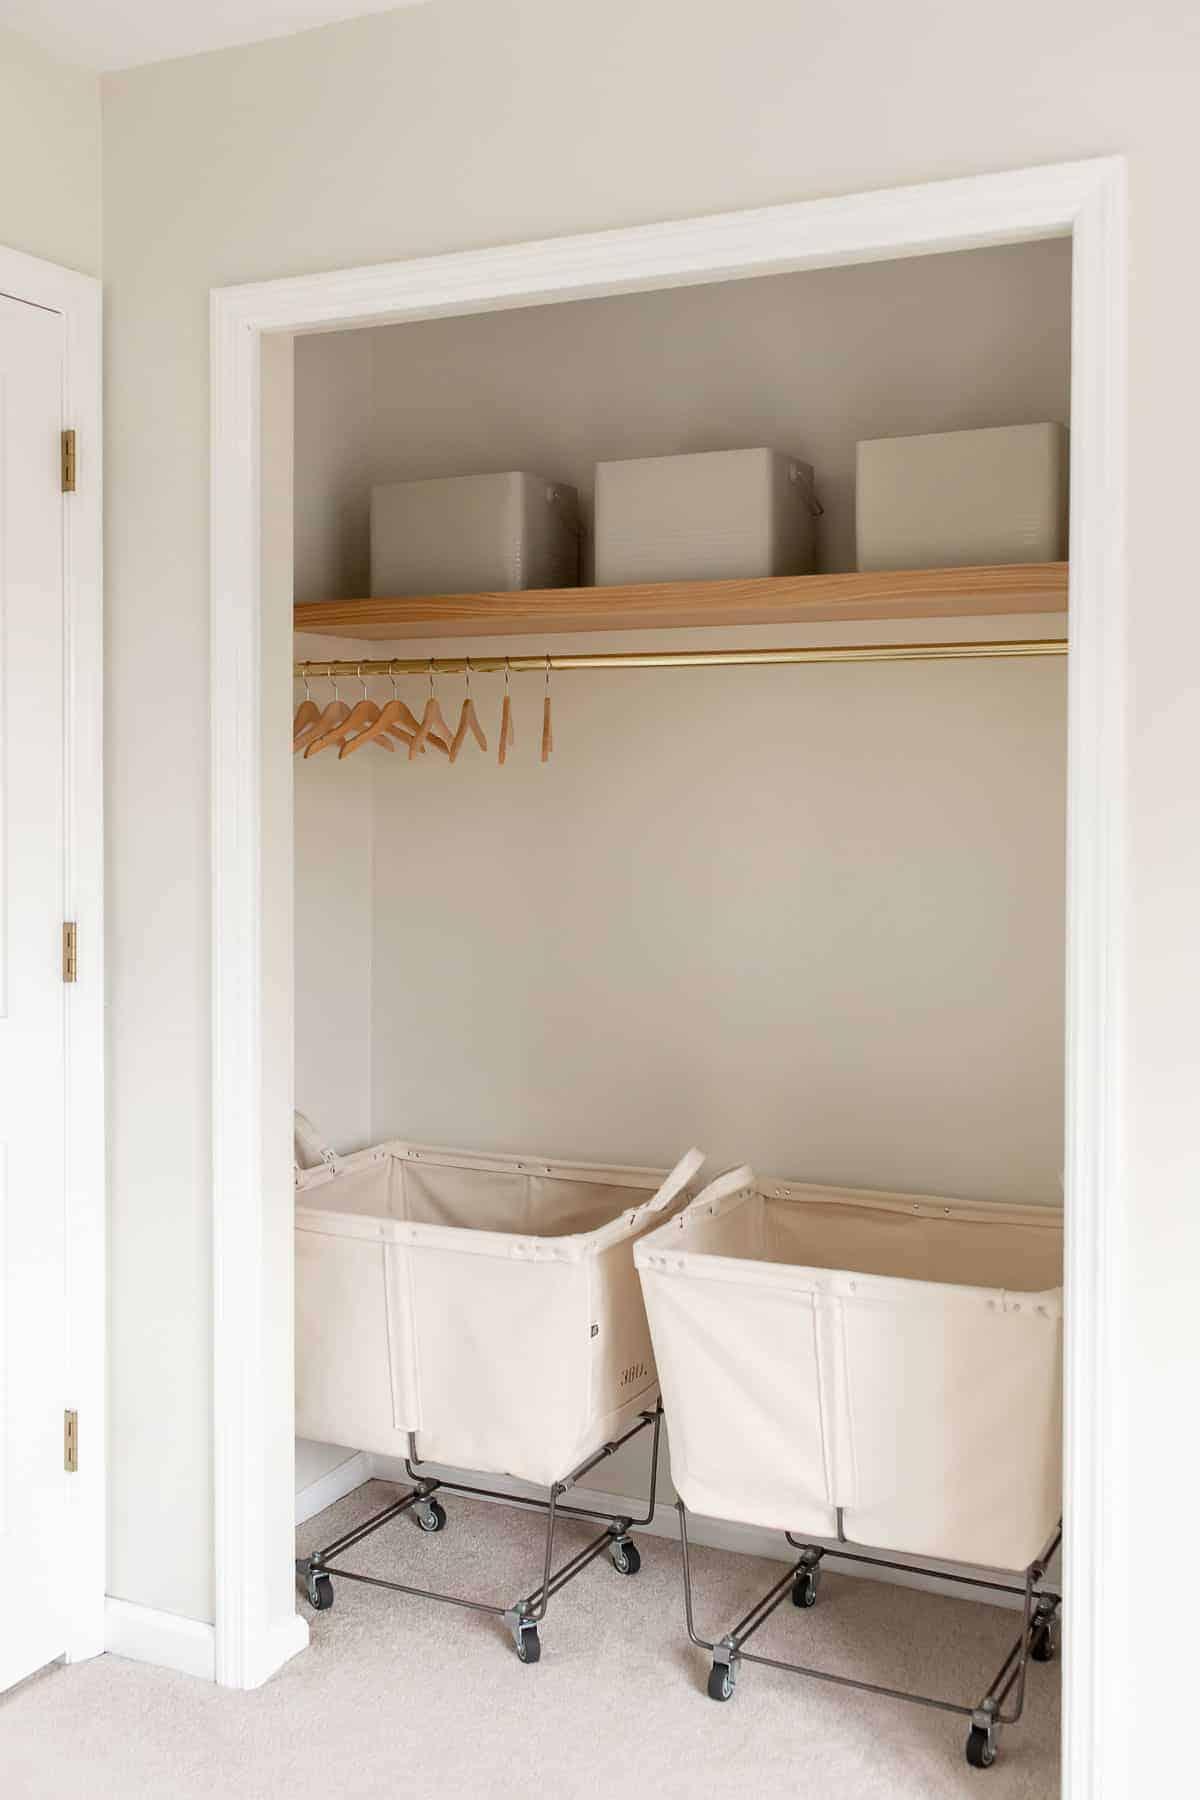 laundry closet with floating shelf and 2 laundry carts